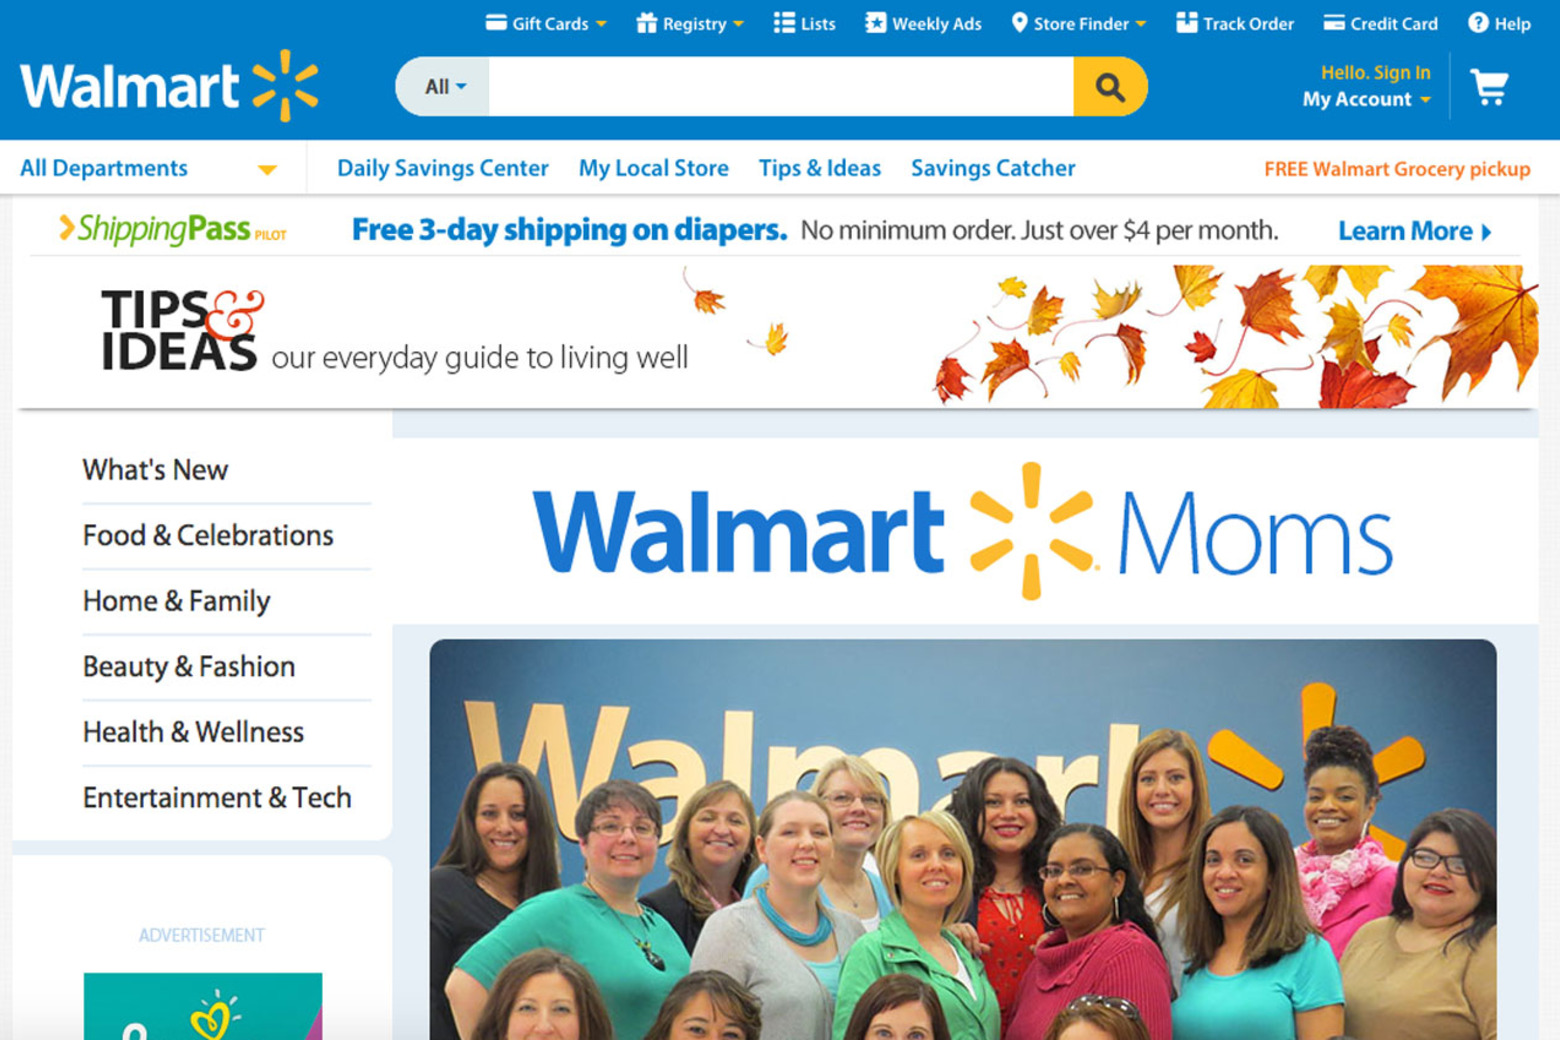 How Walmart Made 11 Moms Become Its Brand Ambassadors | Potion